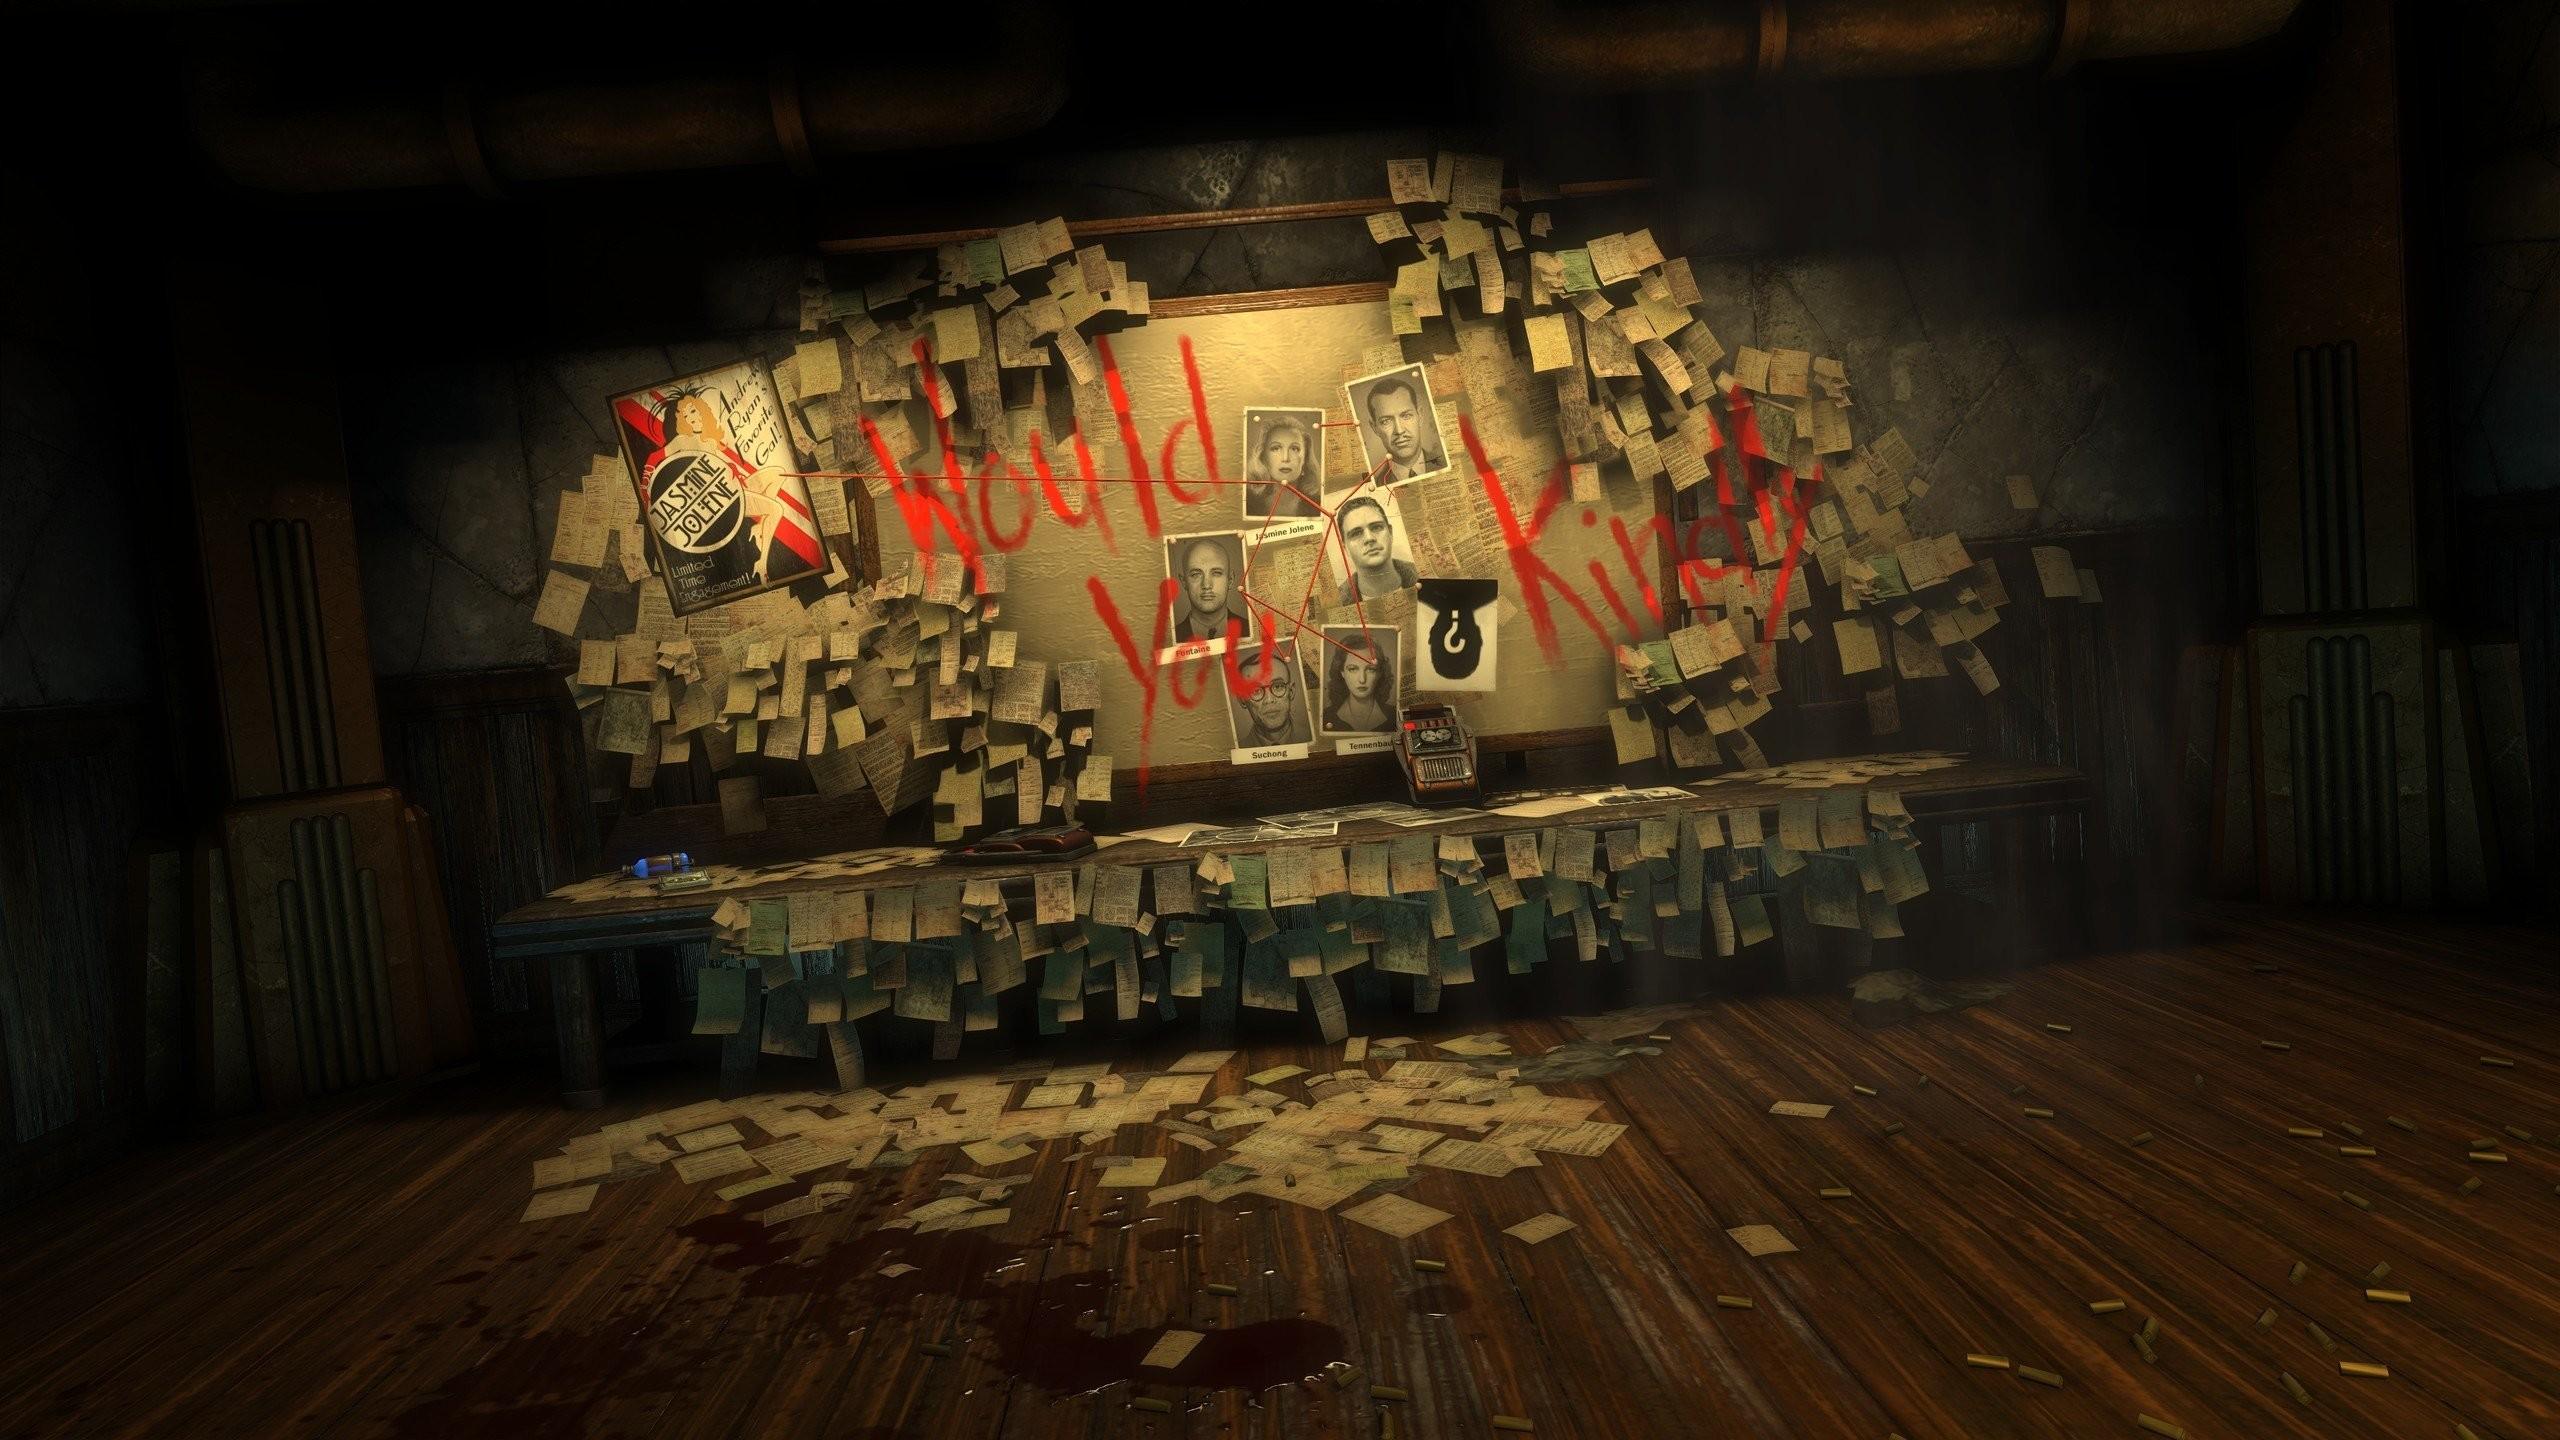 Excellent Bioshock Rapture BioShock Novel HD Wallpaper x | HD Wallpapers |  Pinterest | Bioshock rapture, Bioshock and Wallpaper